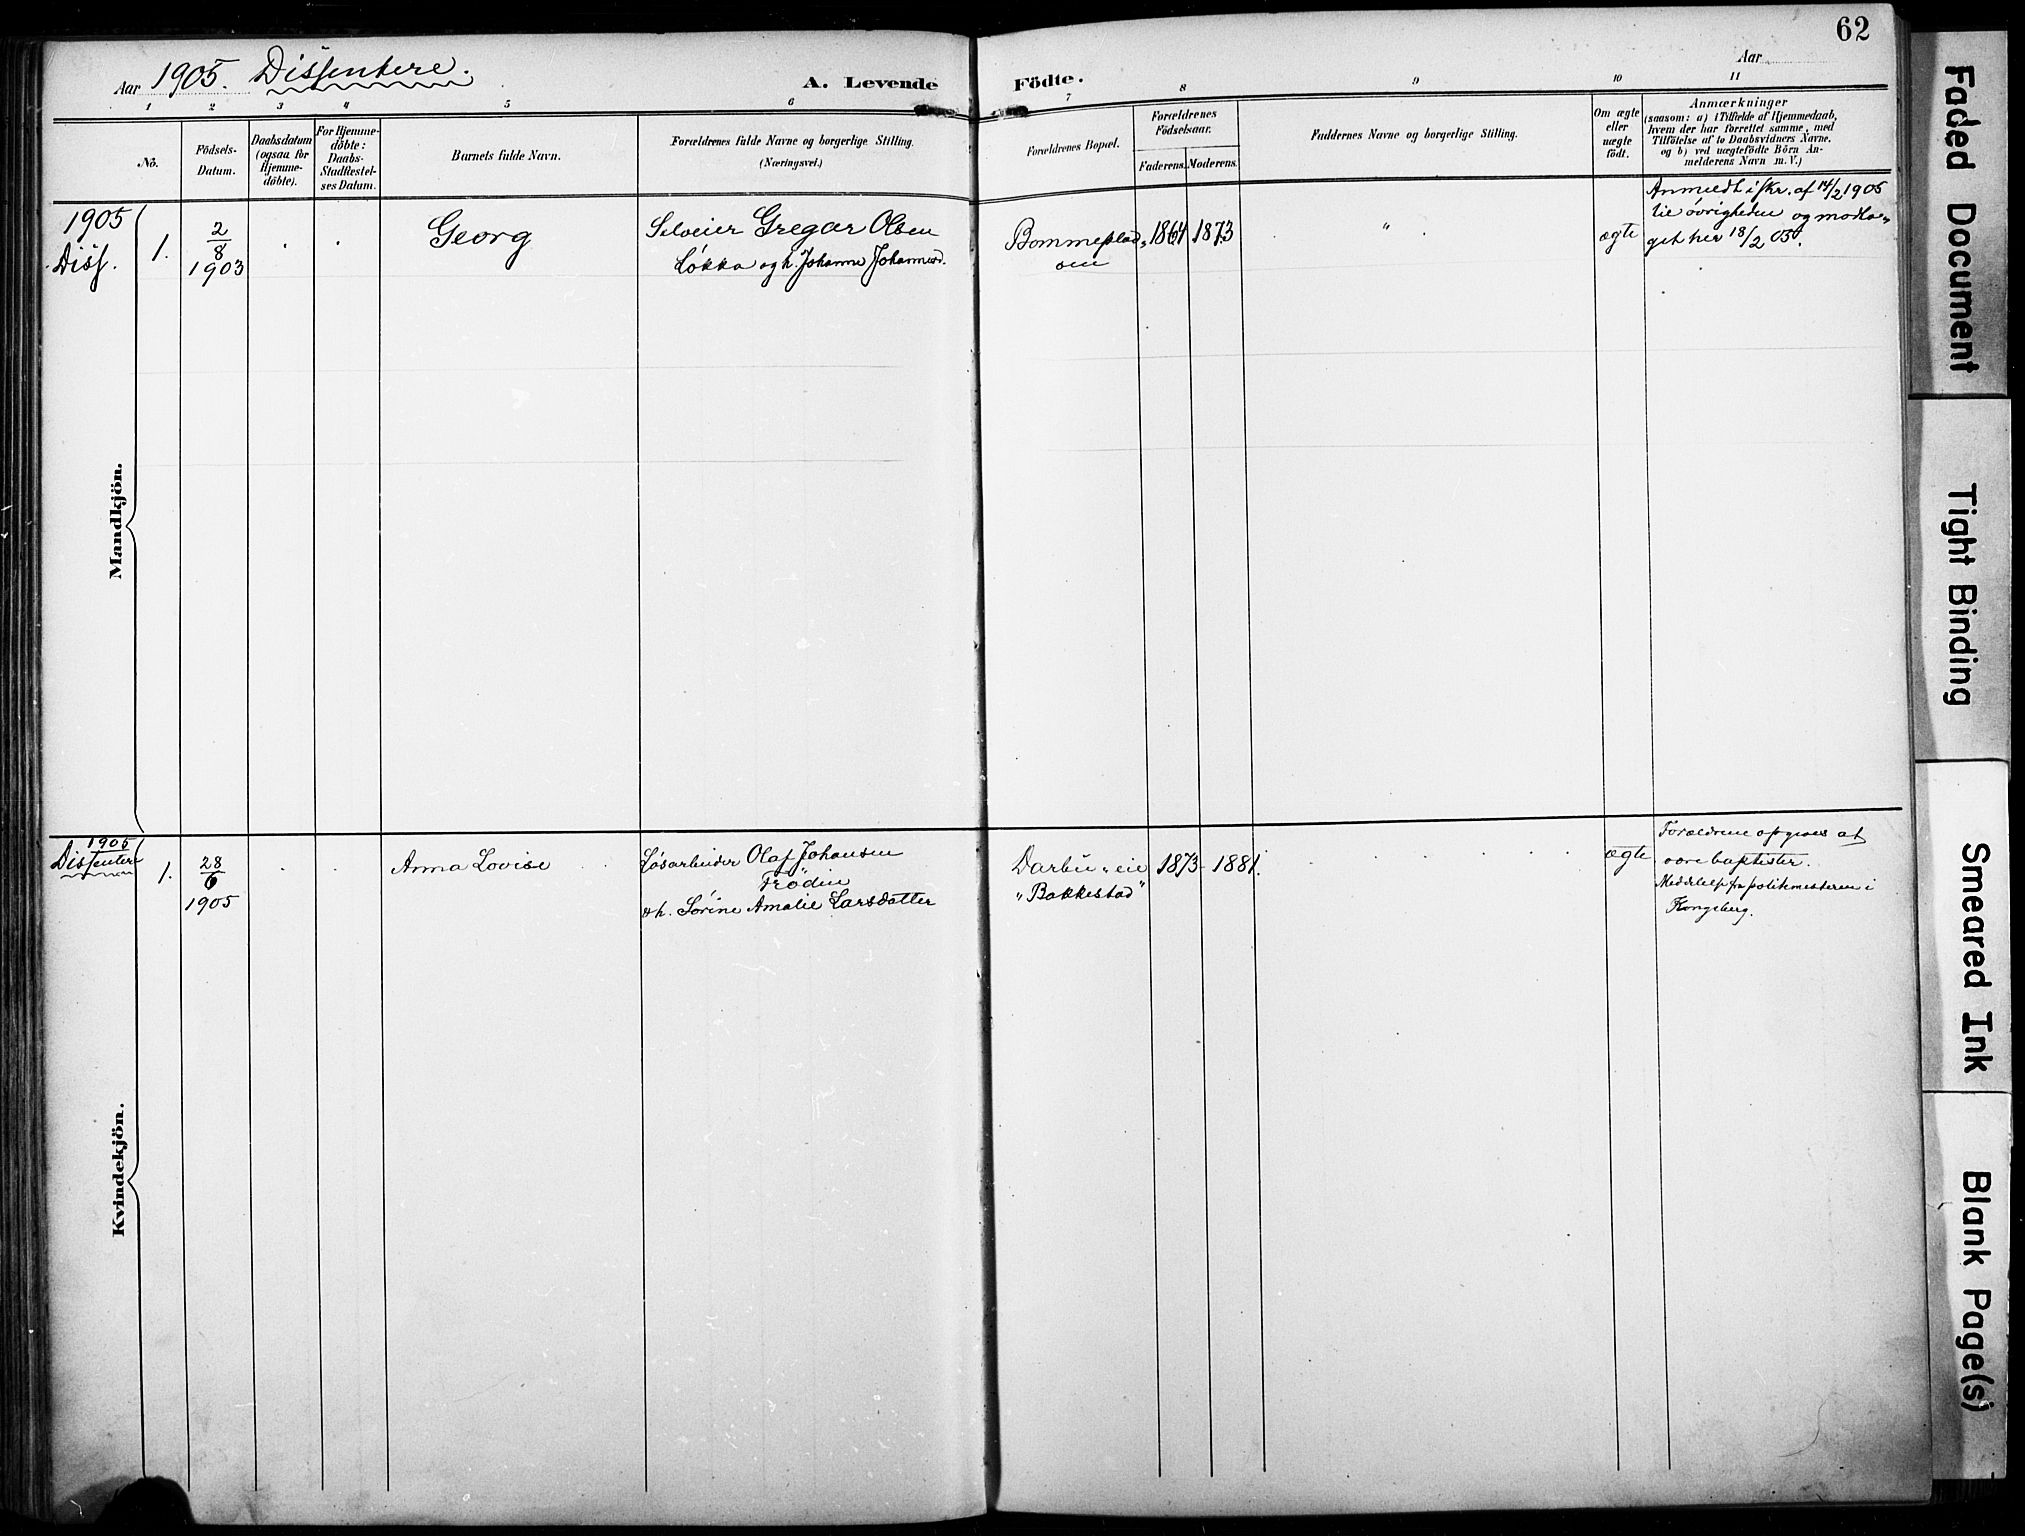 SAKO, Fiskum kirkebøker, F/Fa/L0003: Ministerialbok nr. 3, 1890-1905, s. 62